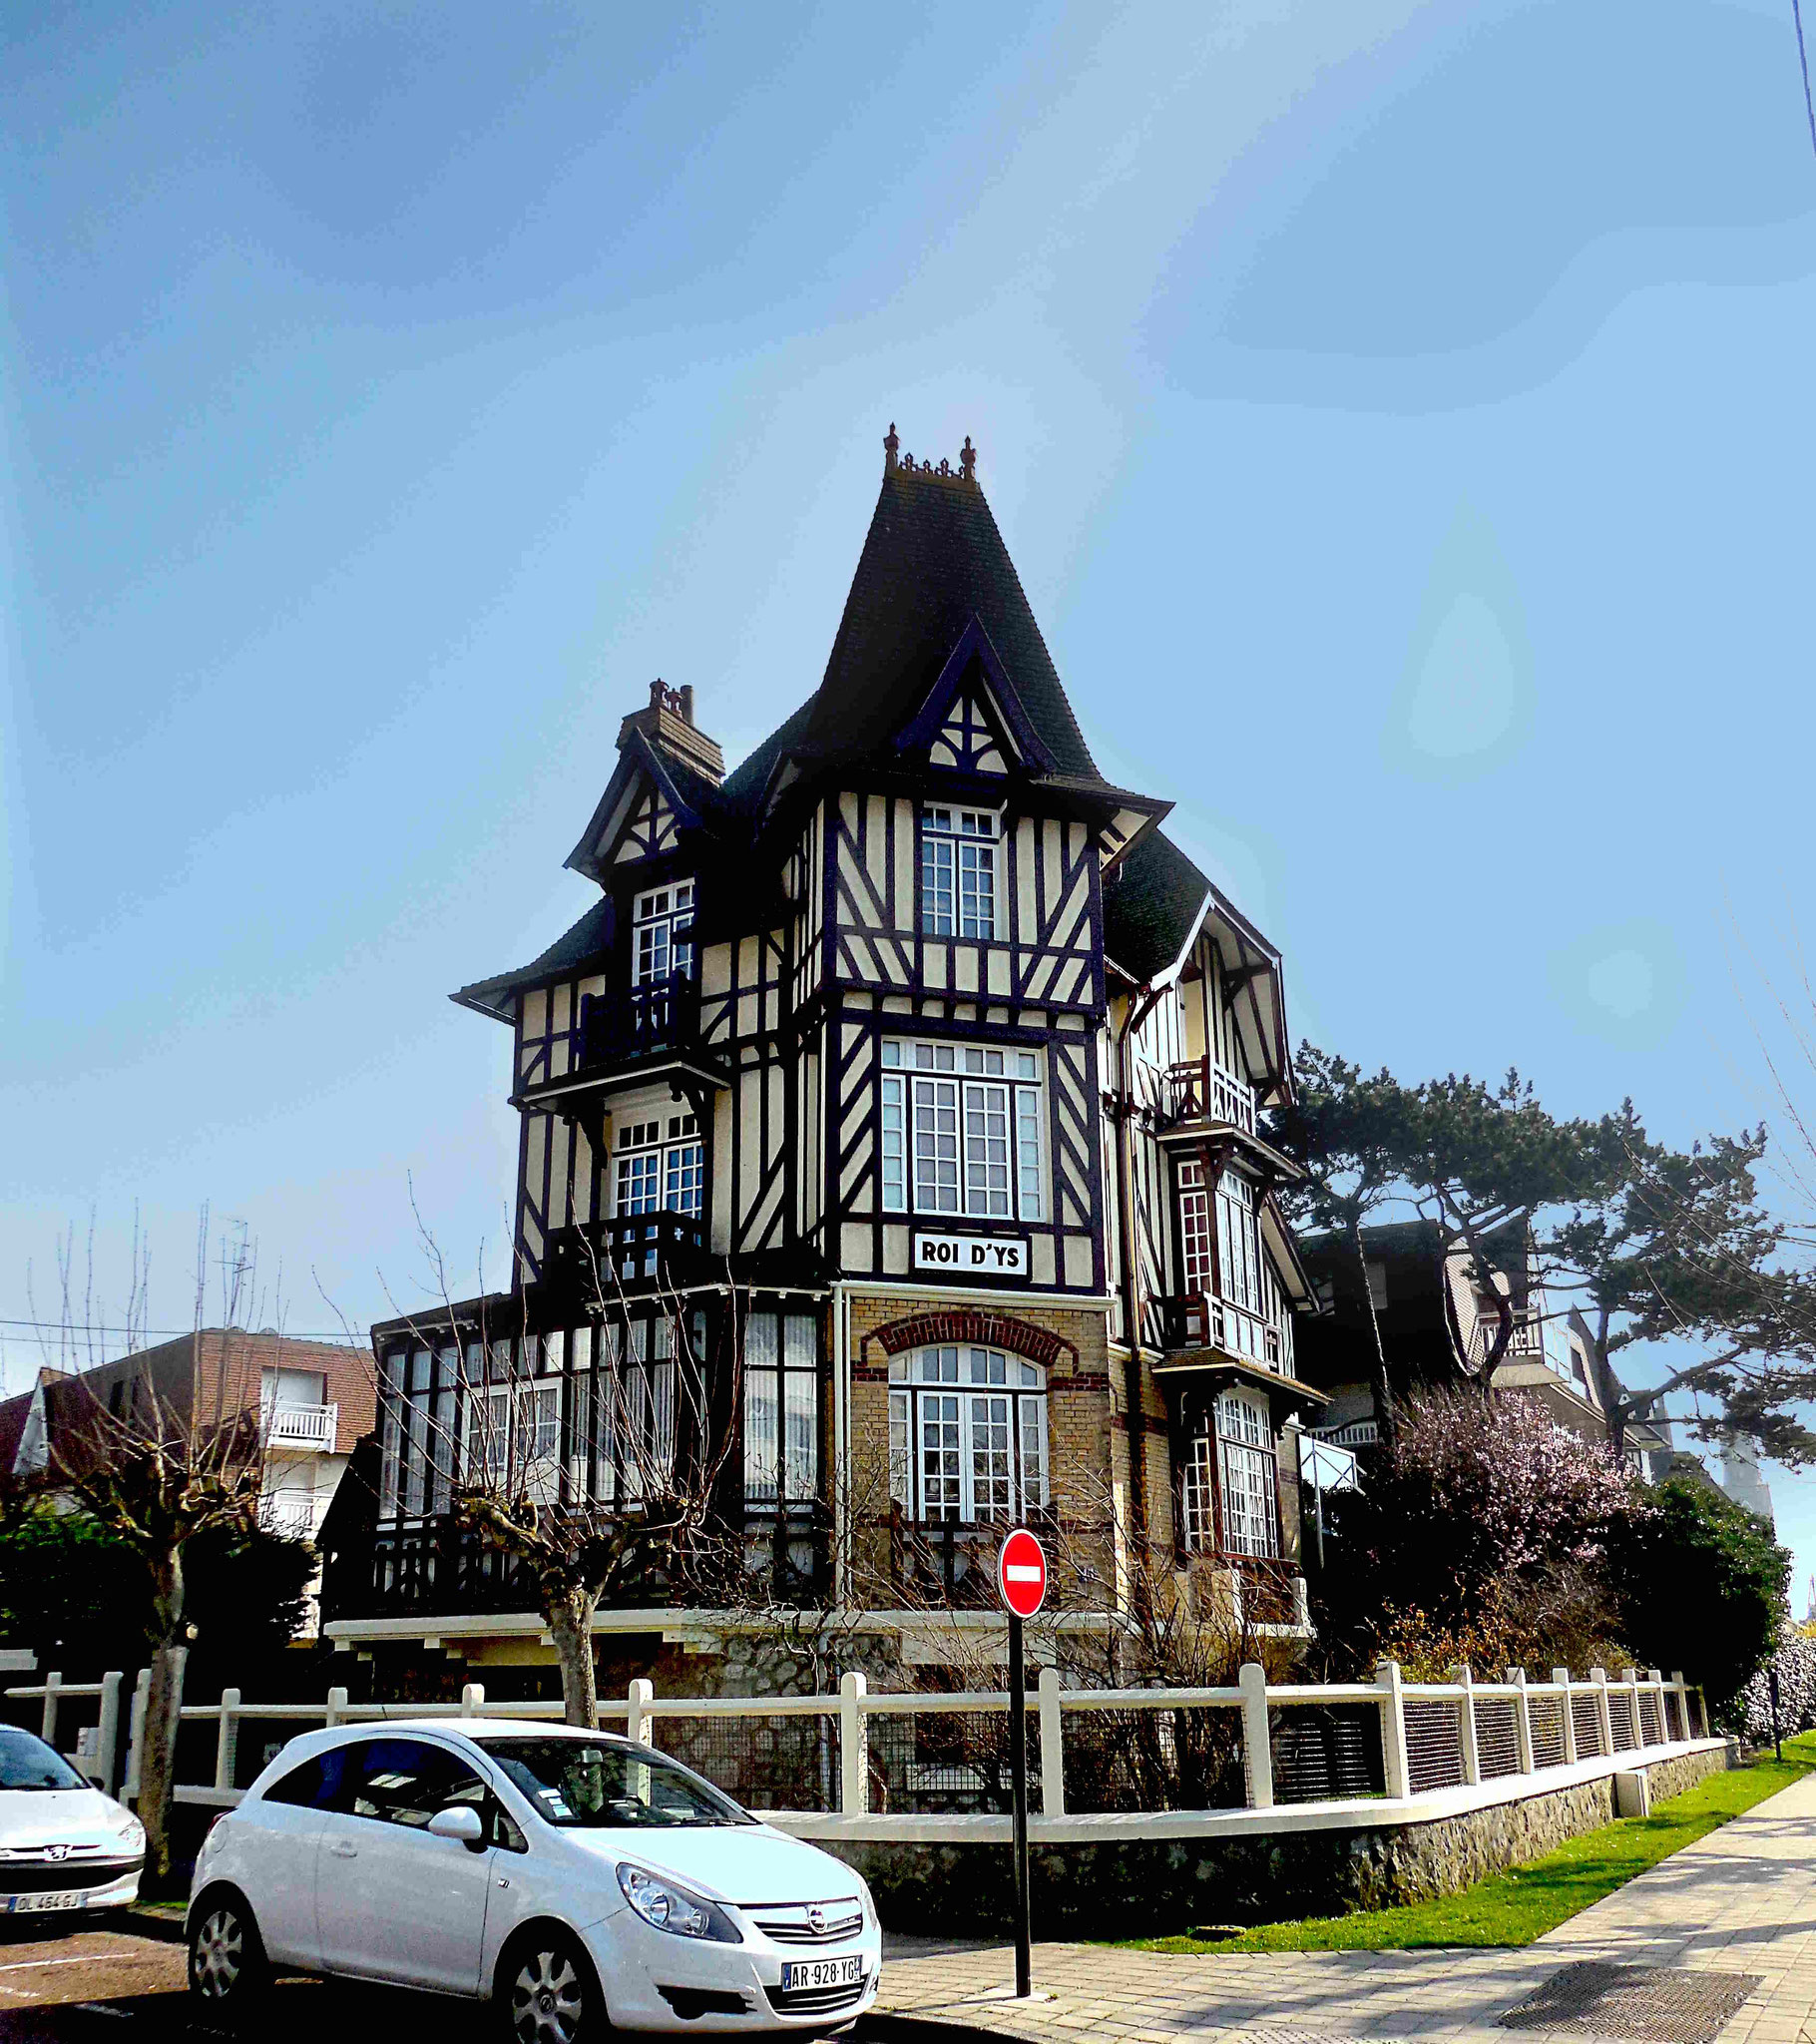 Villa Le Roi d'Ys, 1903 / ph JH